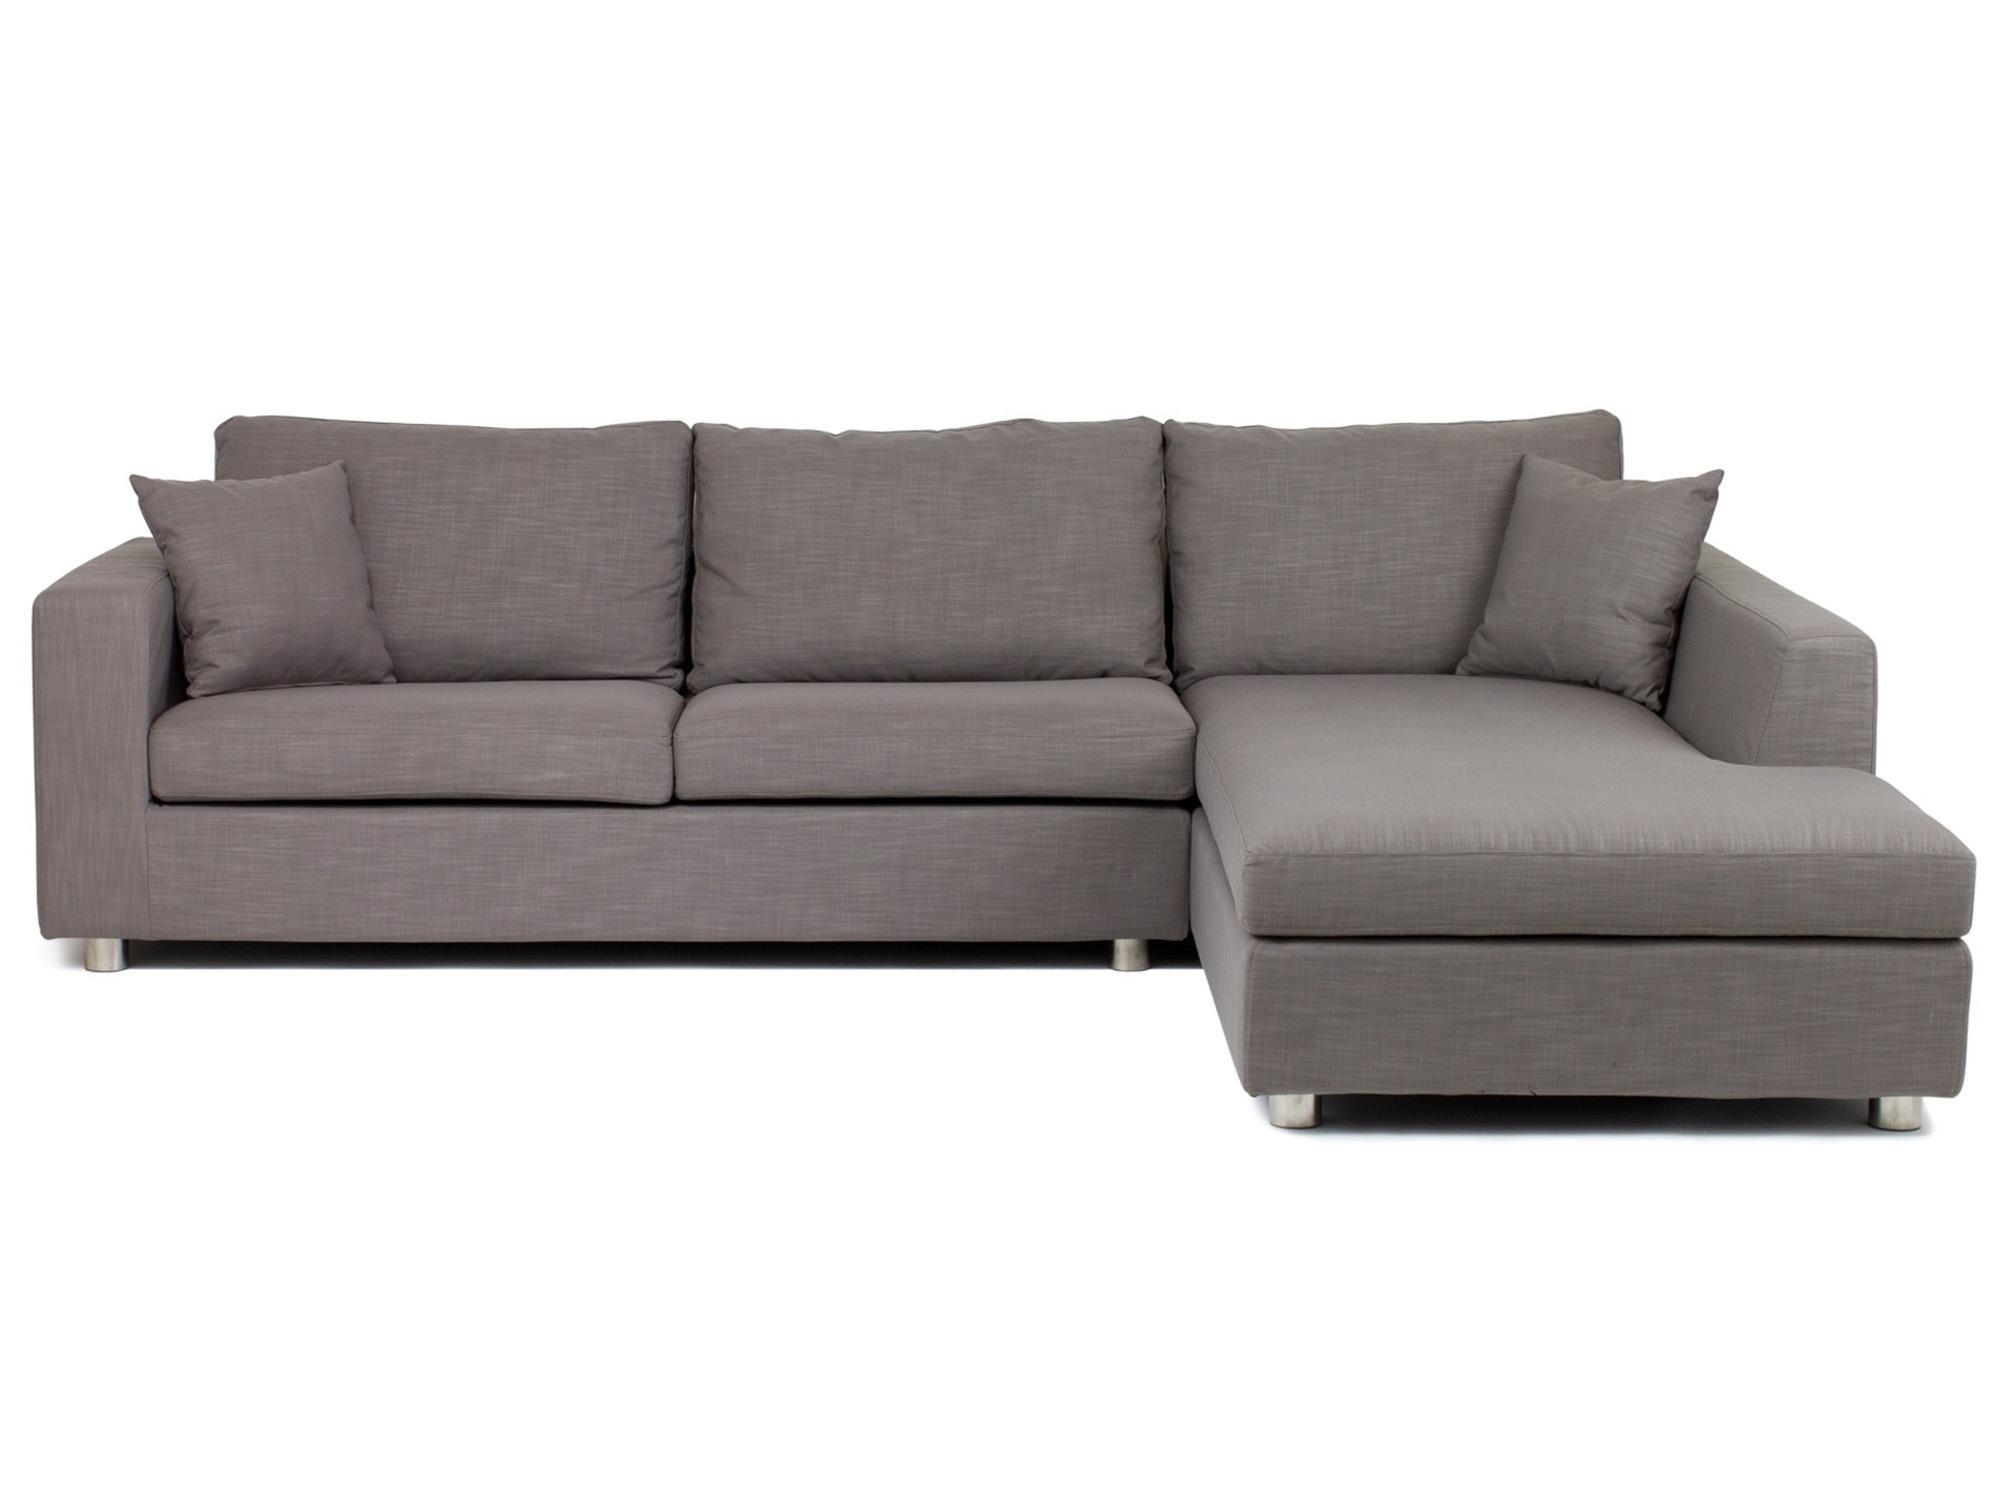 sofa bed uk cheapest charcoal gray 20 photos cheap corner ideas